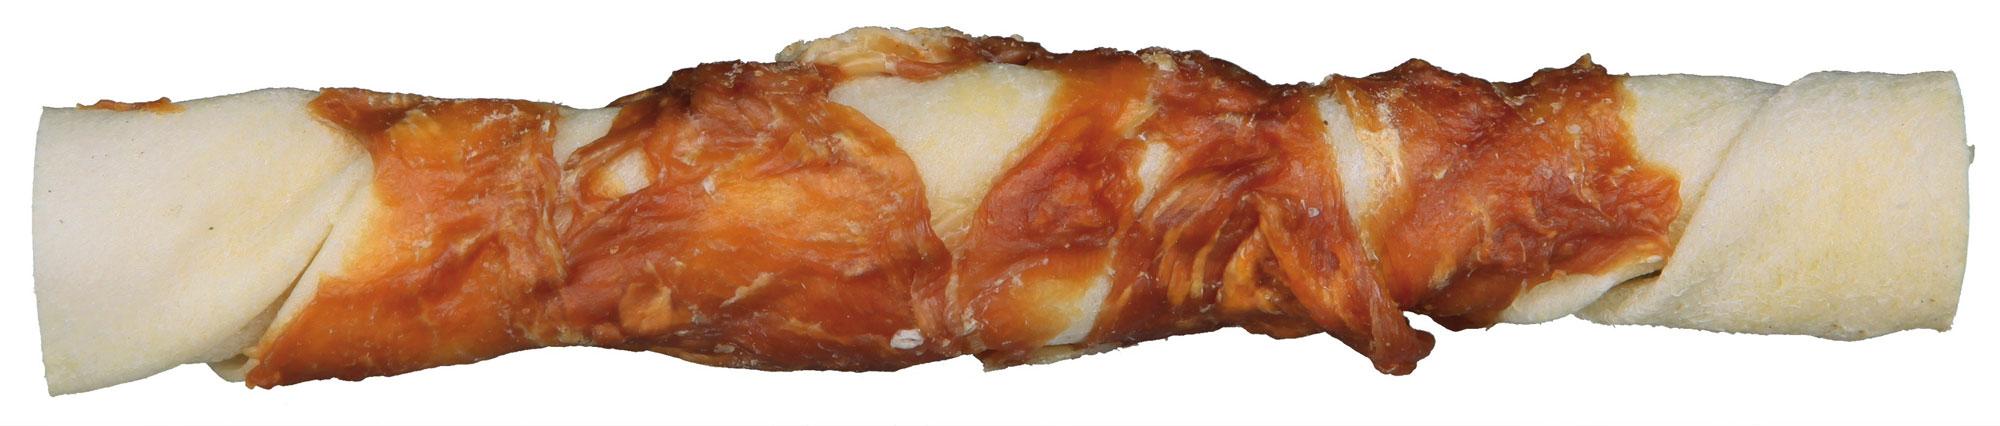 Kauartikel Denta Fun Kaurollen Huhn TRIXIE 17cm 3Stück Bild 1